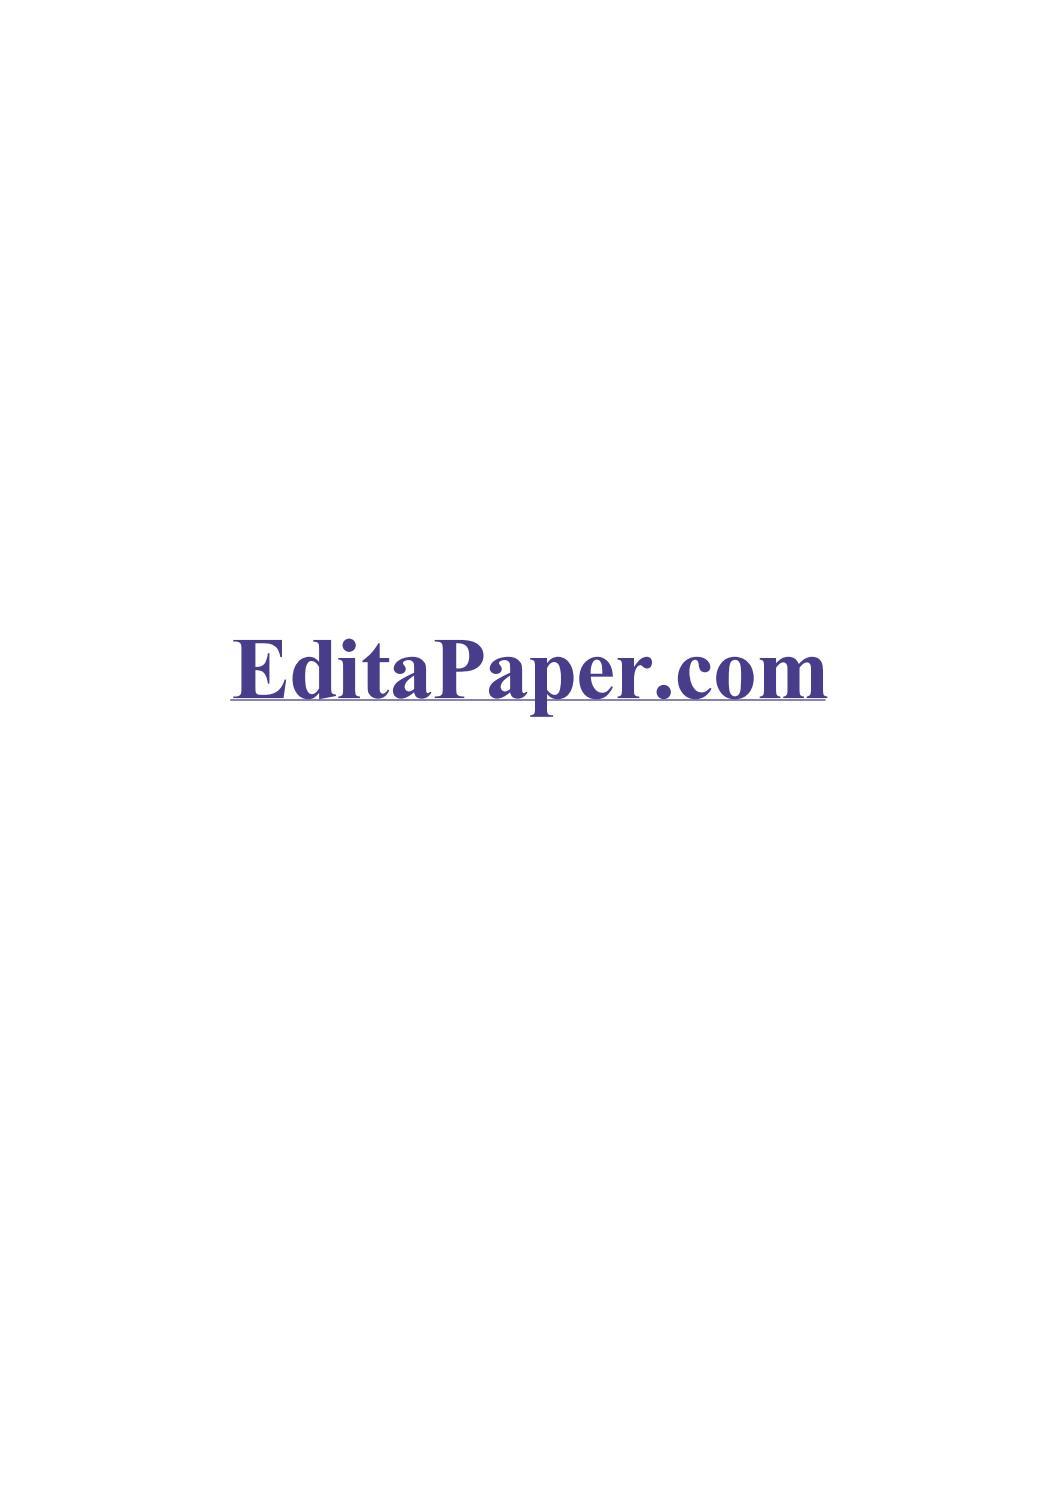 Nikhil salvi thesis best mba essay writers sites uk